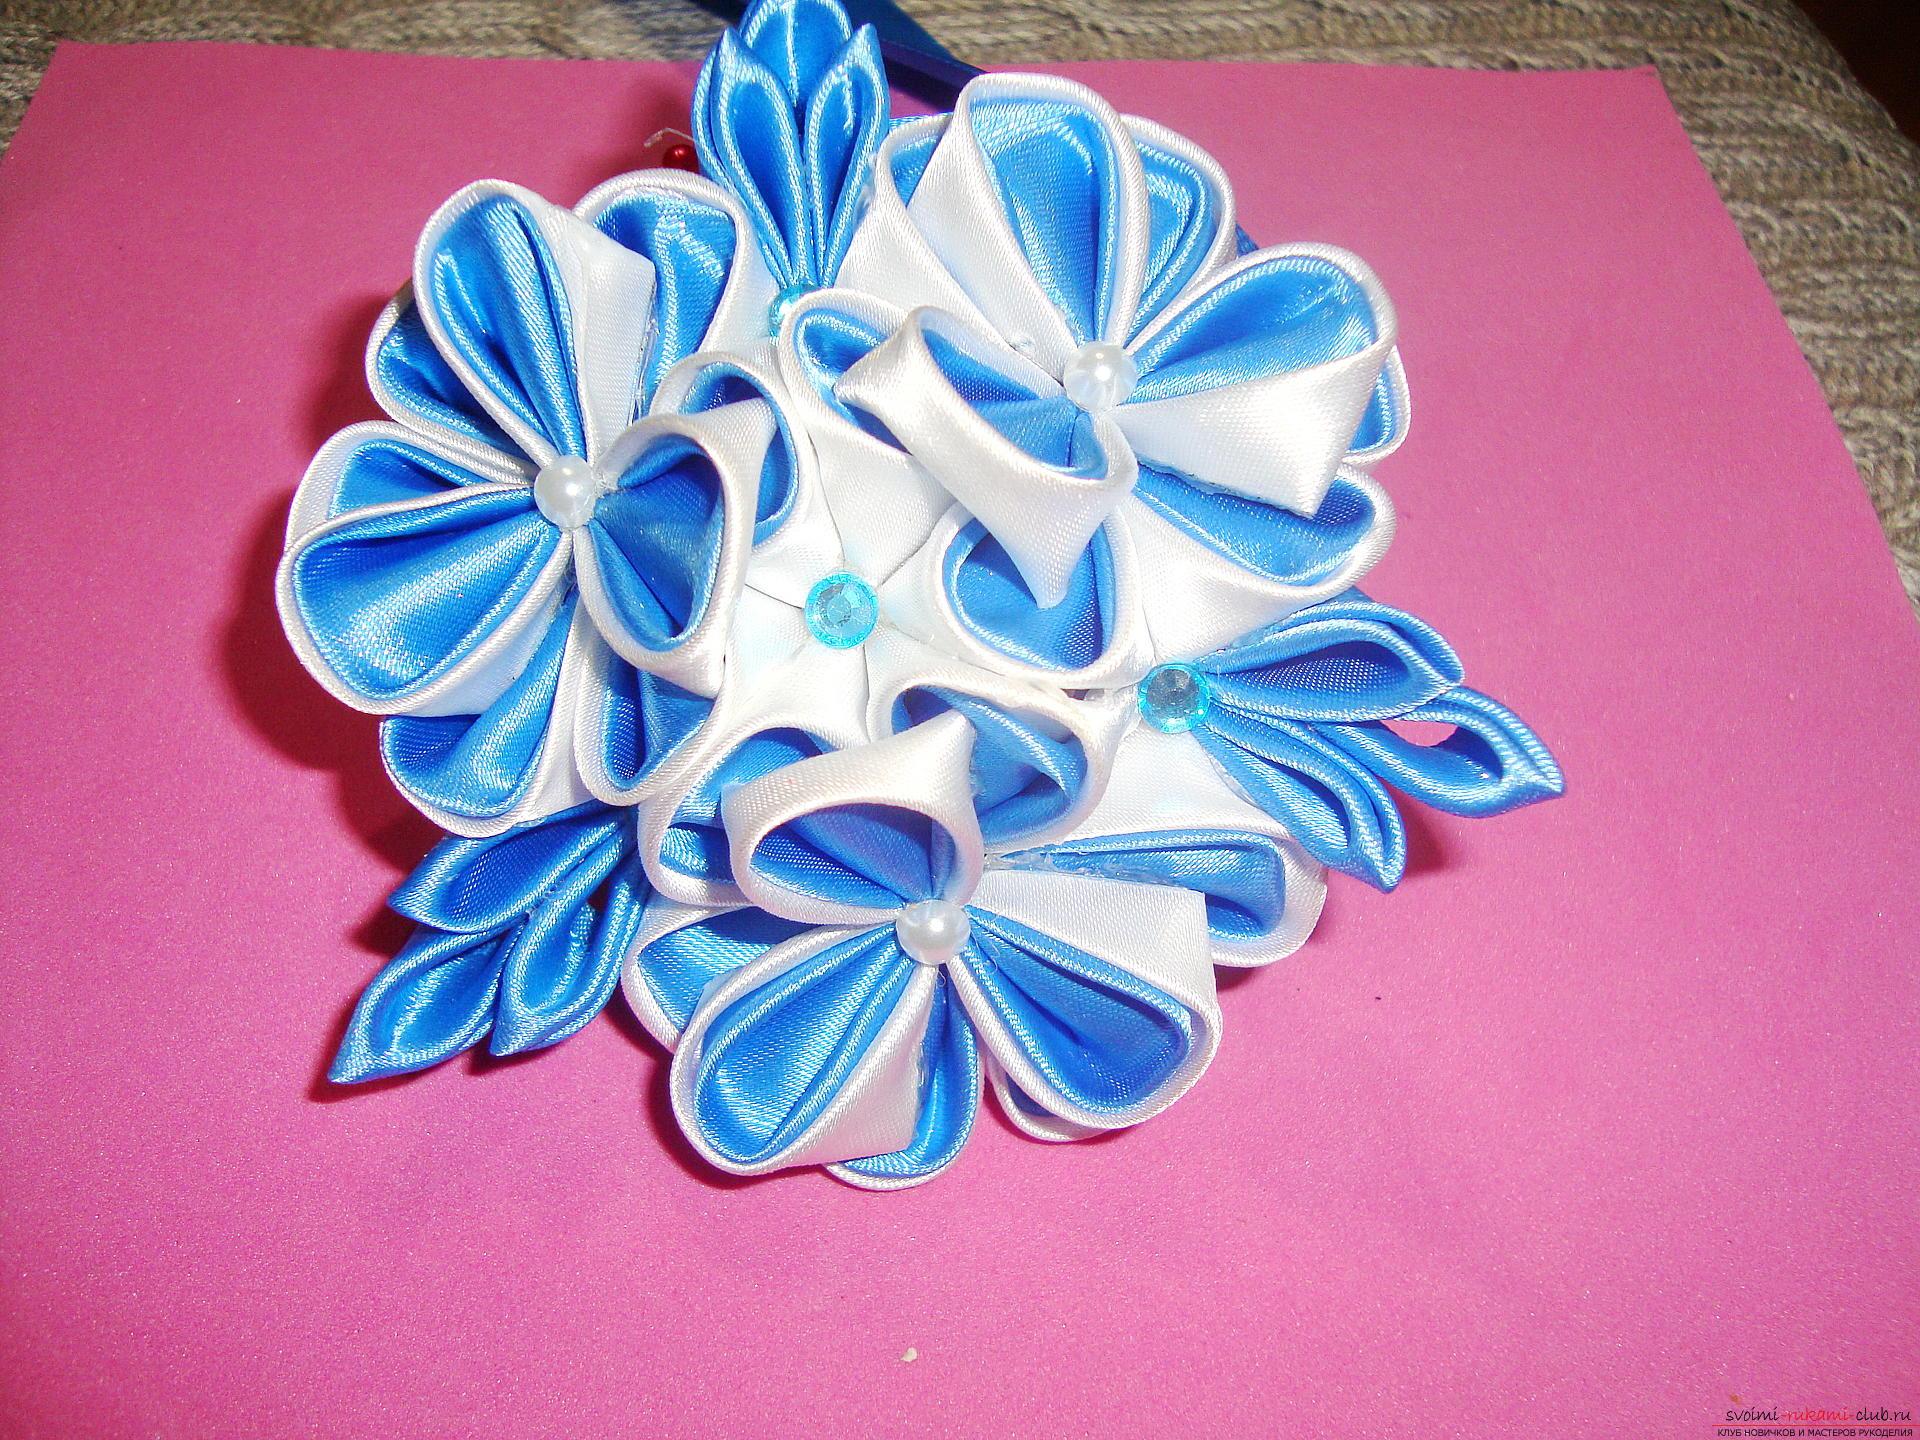 Фото инструкция по изготовлению заколки из лент голубого цвета в технике канзаши. Фото №1